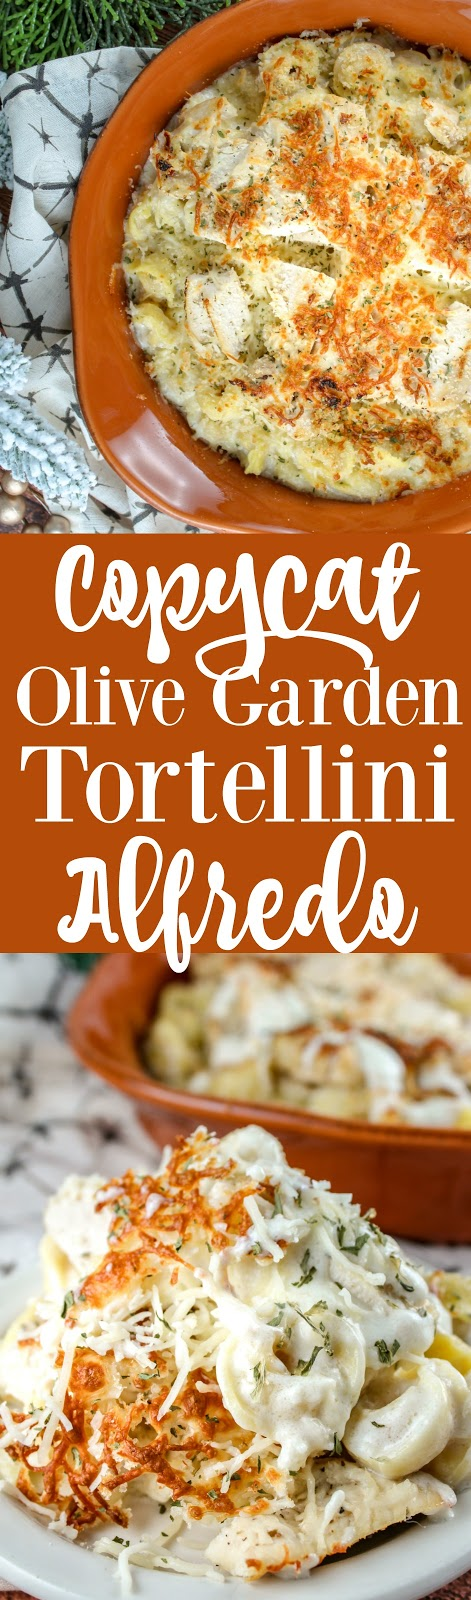 Copycat Olive Garden Oven Baked Tortellini Alfredo The Food Hussy